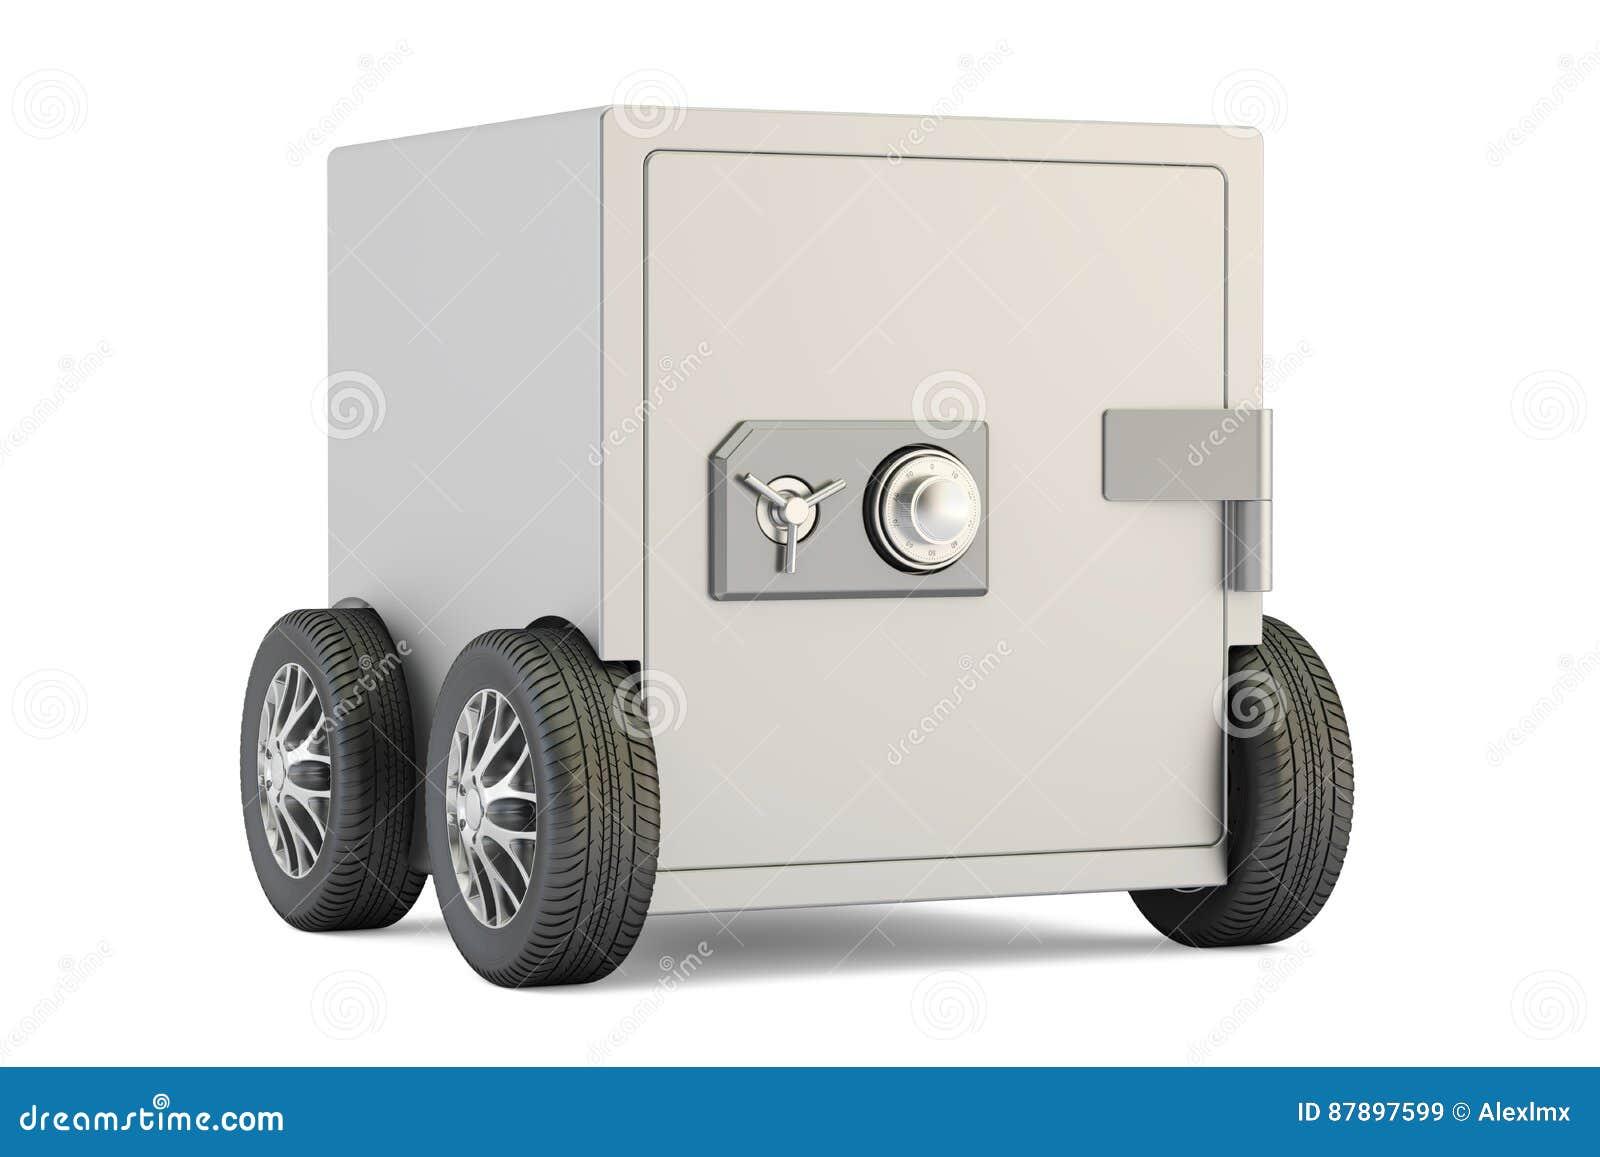 Safe Box On Car Wheels 3d Rendering Stock Illustration Image